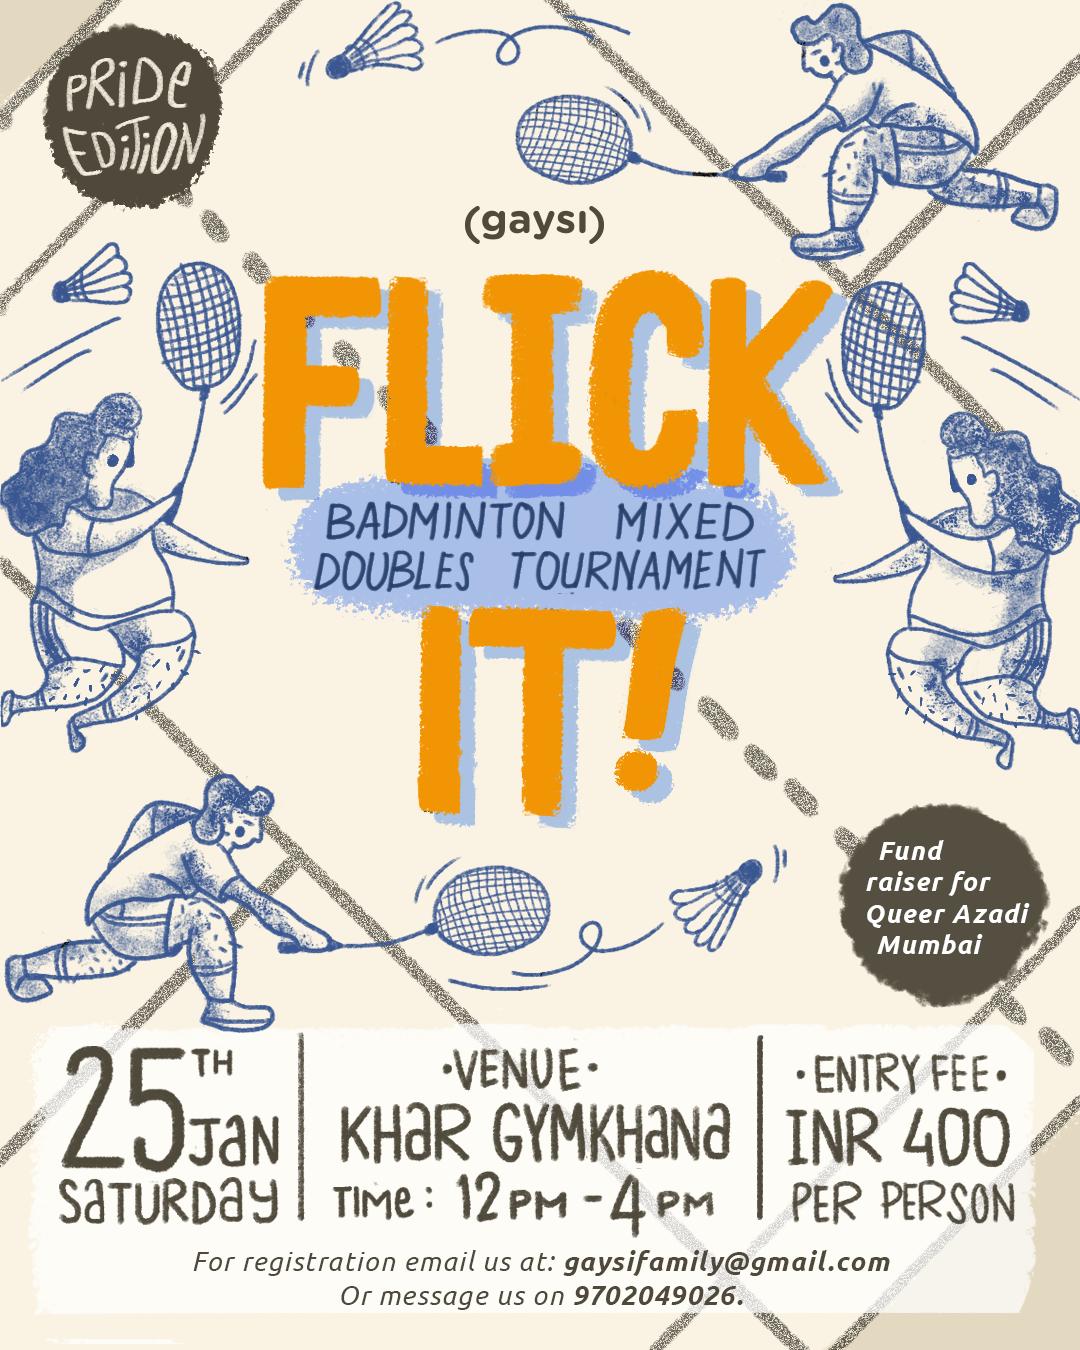 FLICK IT! Mixed Doubles Badminton Tournament (Pride Edition)